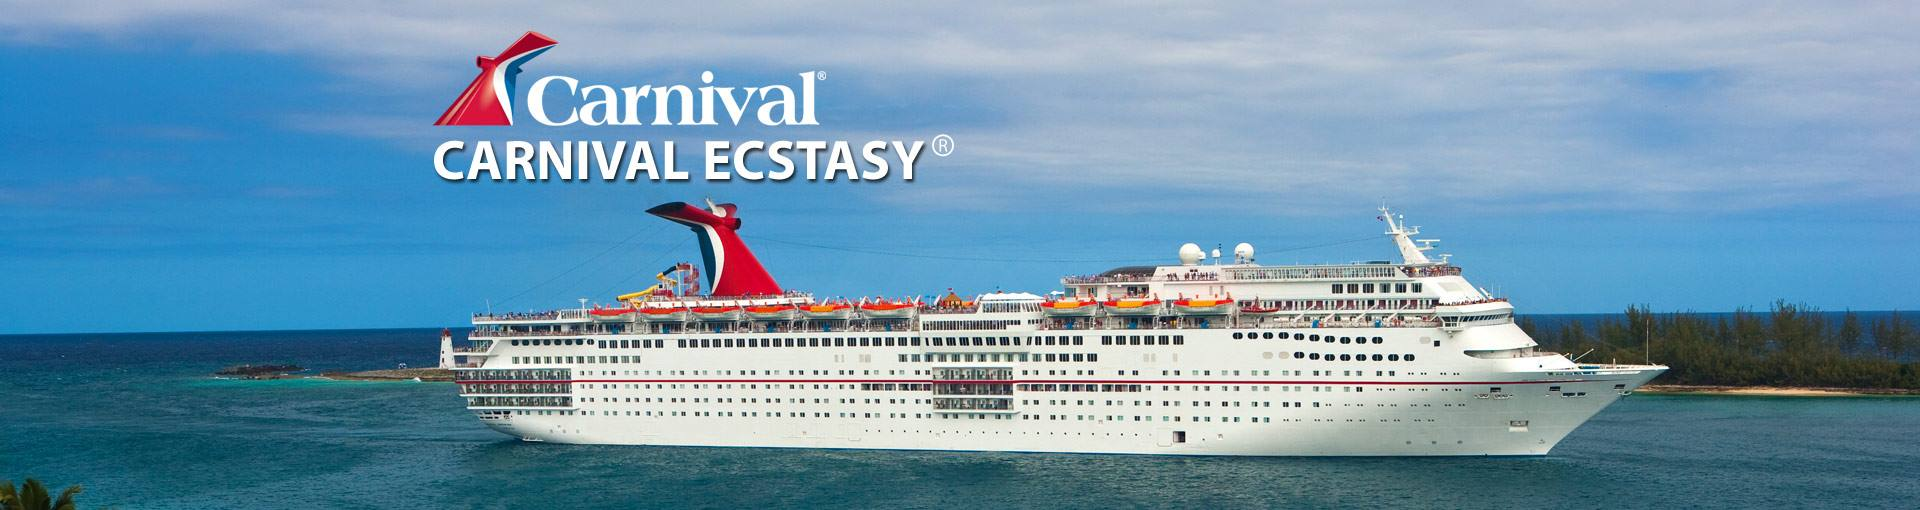 Cruise Kickback Charleston SC To Nassau Bahamas Tickets - Cruise ships charleston sc